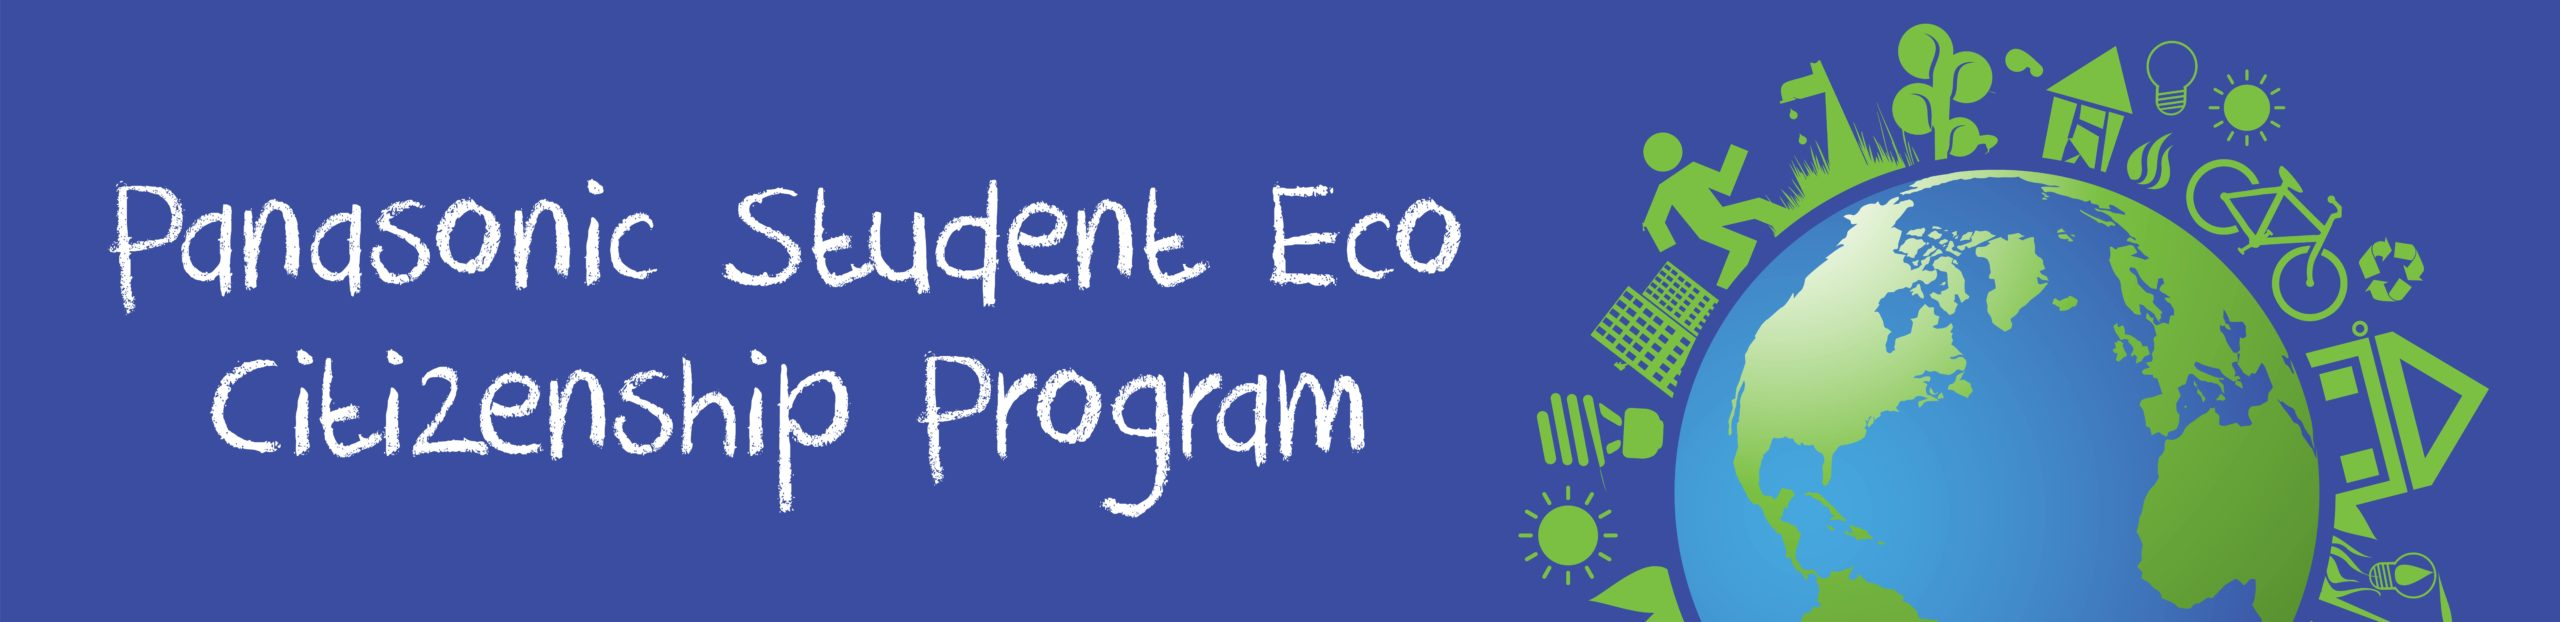 Panasonic Student Eco Citizenship Program